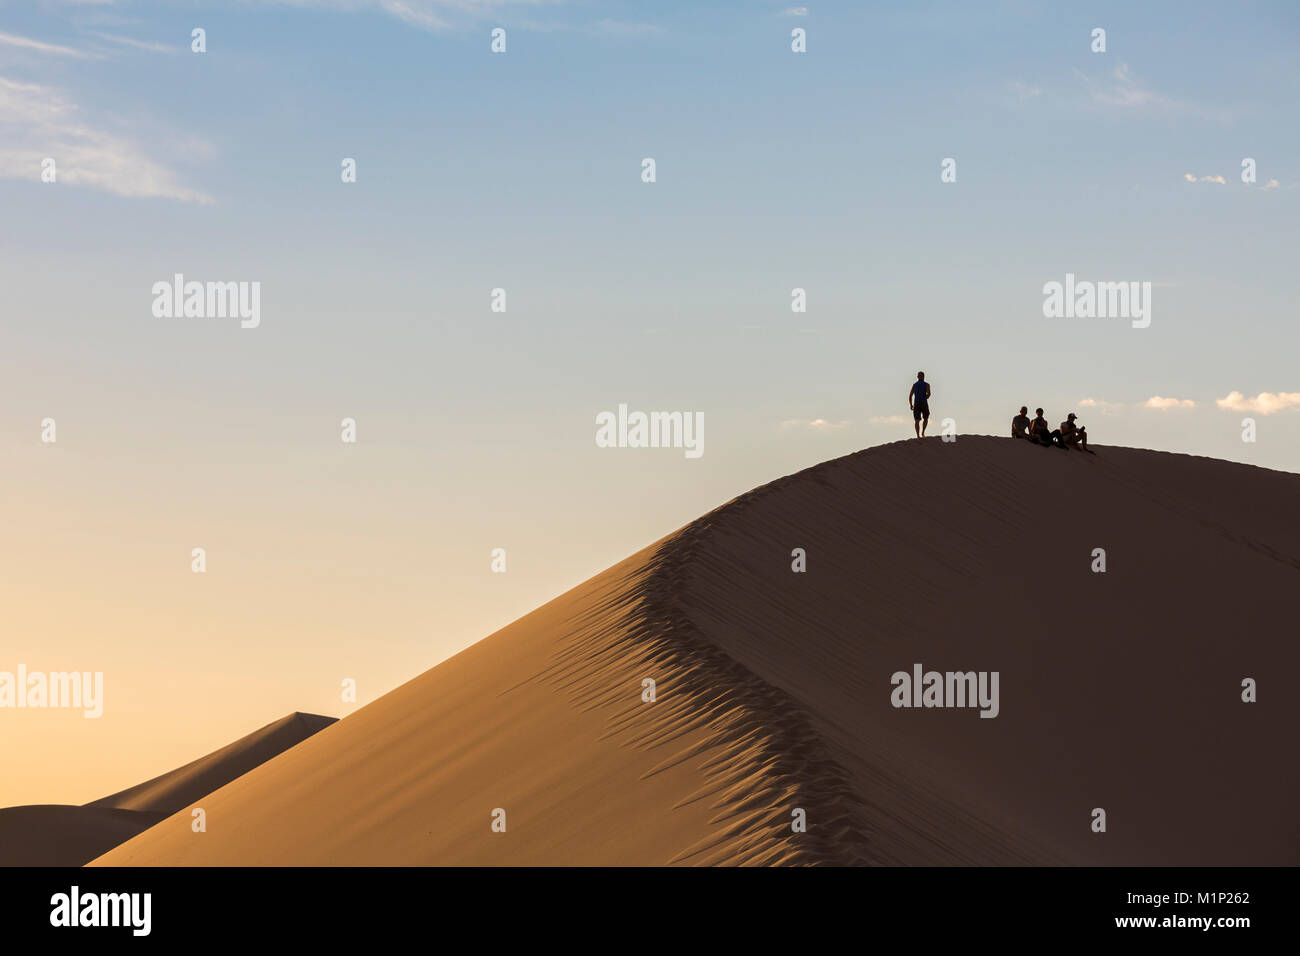 People in silhouette on Khongor sand dunes in Gobi Gurvan Saikhan National Park, Sevrei district, South Gobi province, - Stock Image